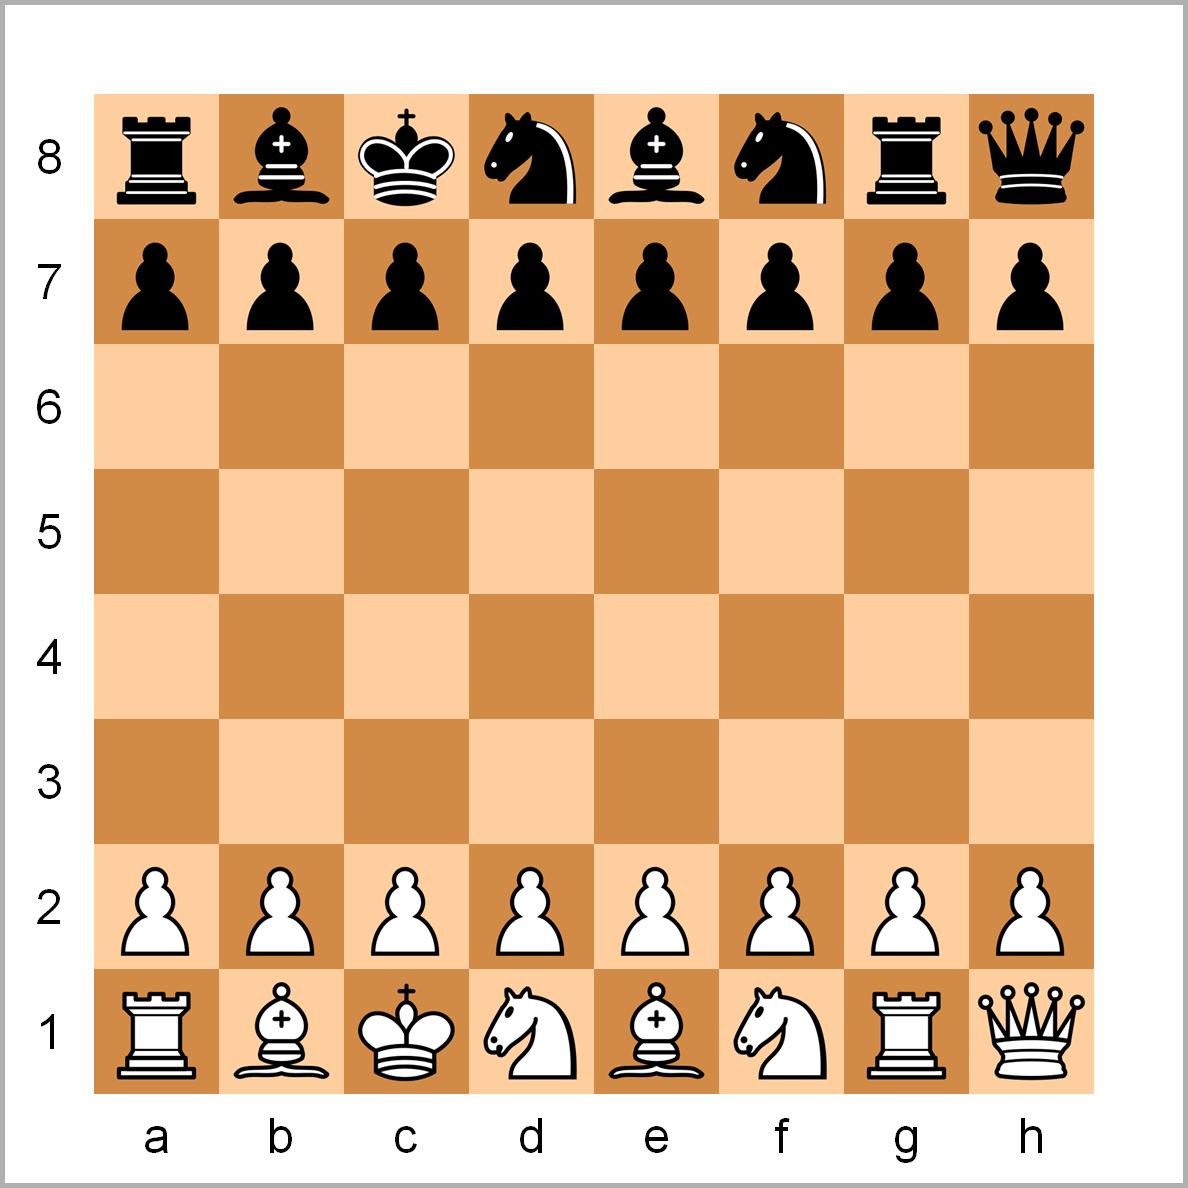 chess board setup diagram 2006 club car precedent battery wiring chess960 wikipedia